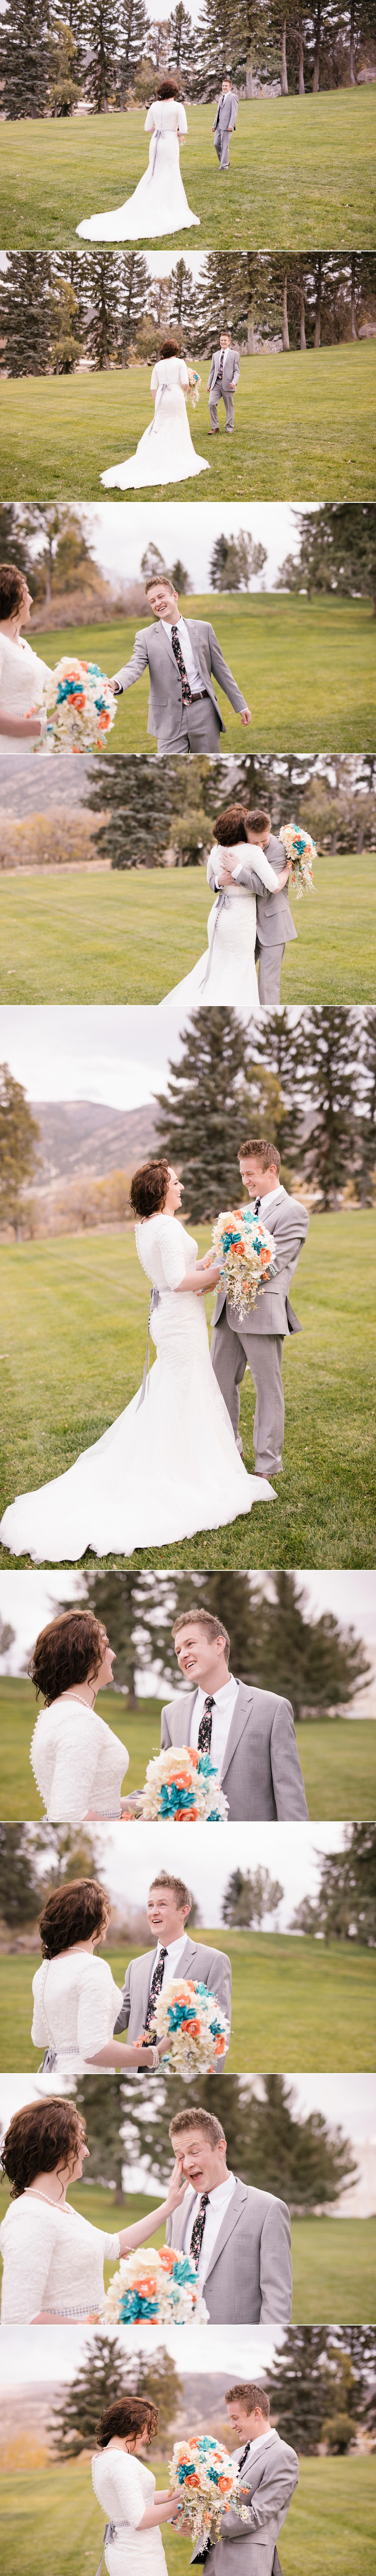 BA-Bridals-1_Lizzie-B-Imagery-Utah-Wedding-Photographer-Engagement-Photography-Salt-Lake-City-Park-City-Utah-County-Manti-Utah-Temple-1.jpg